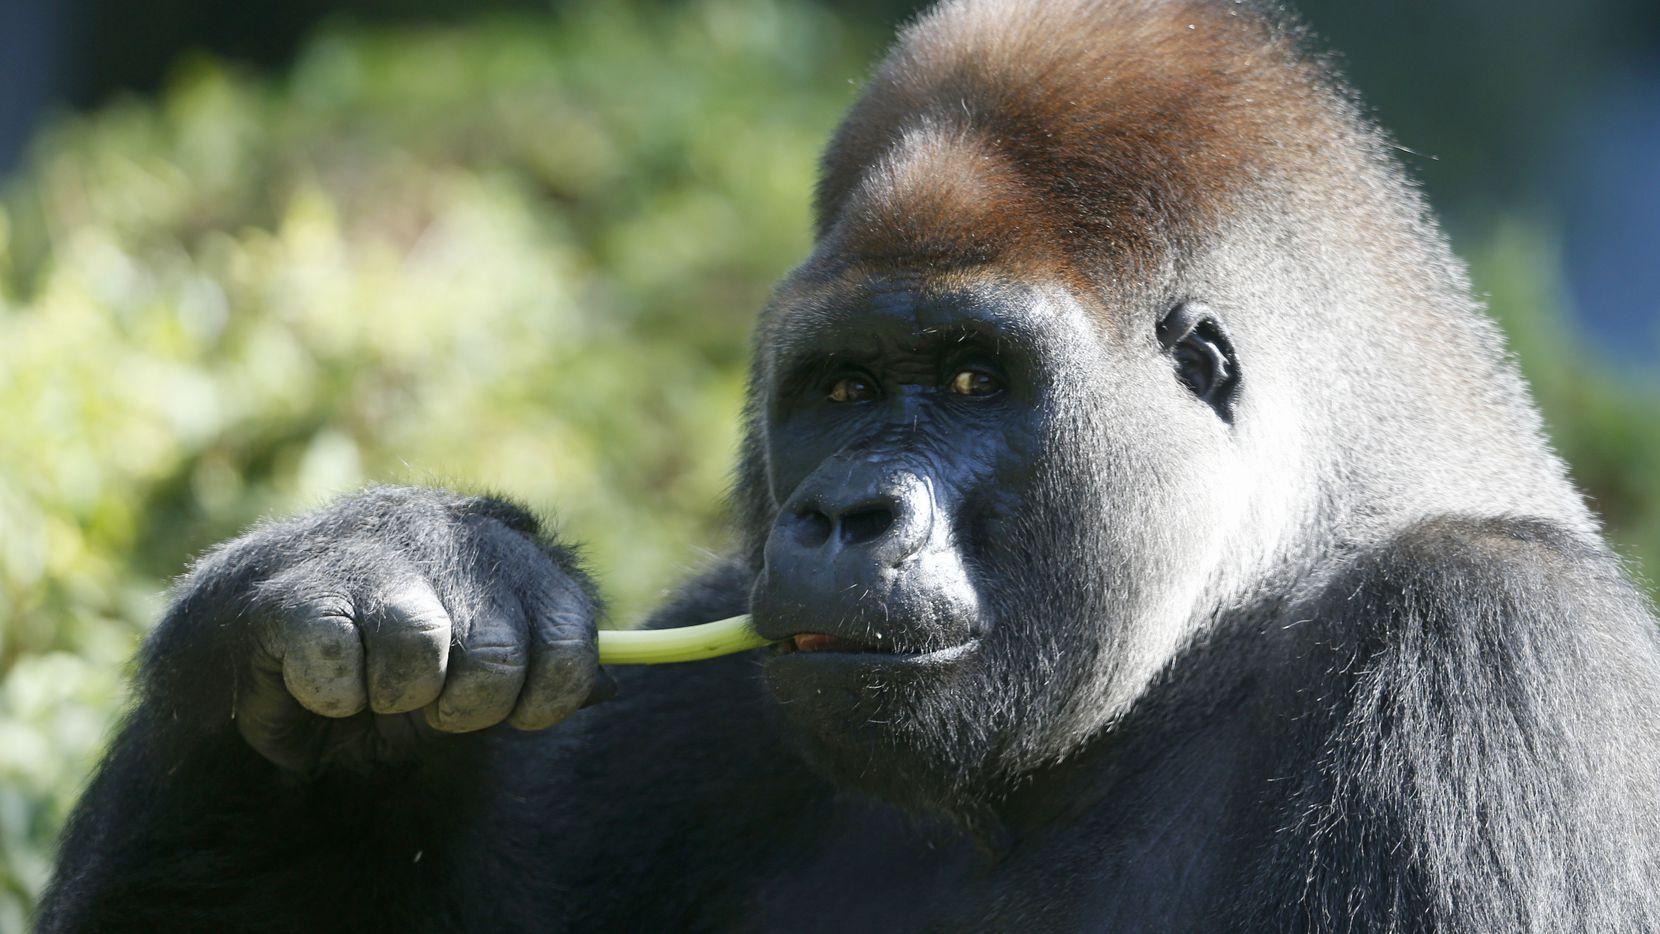 Subira eats celery at the Dallas Zoo on July 5, 2018.